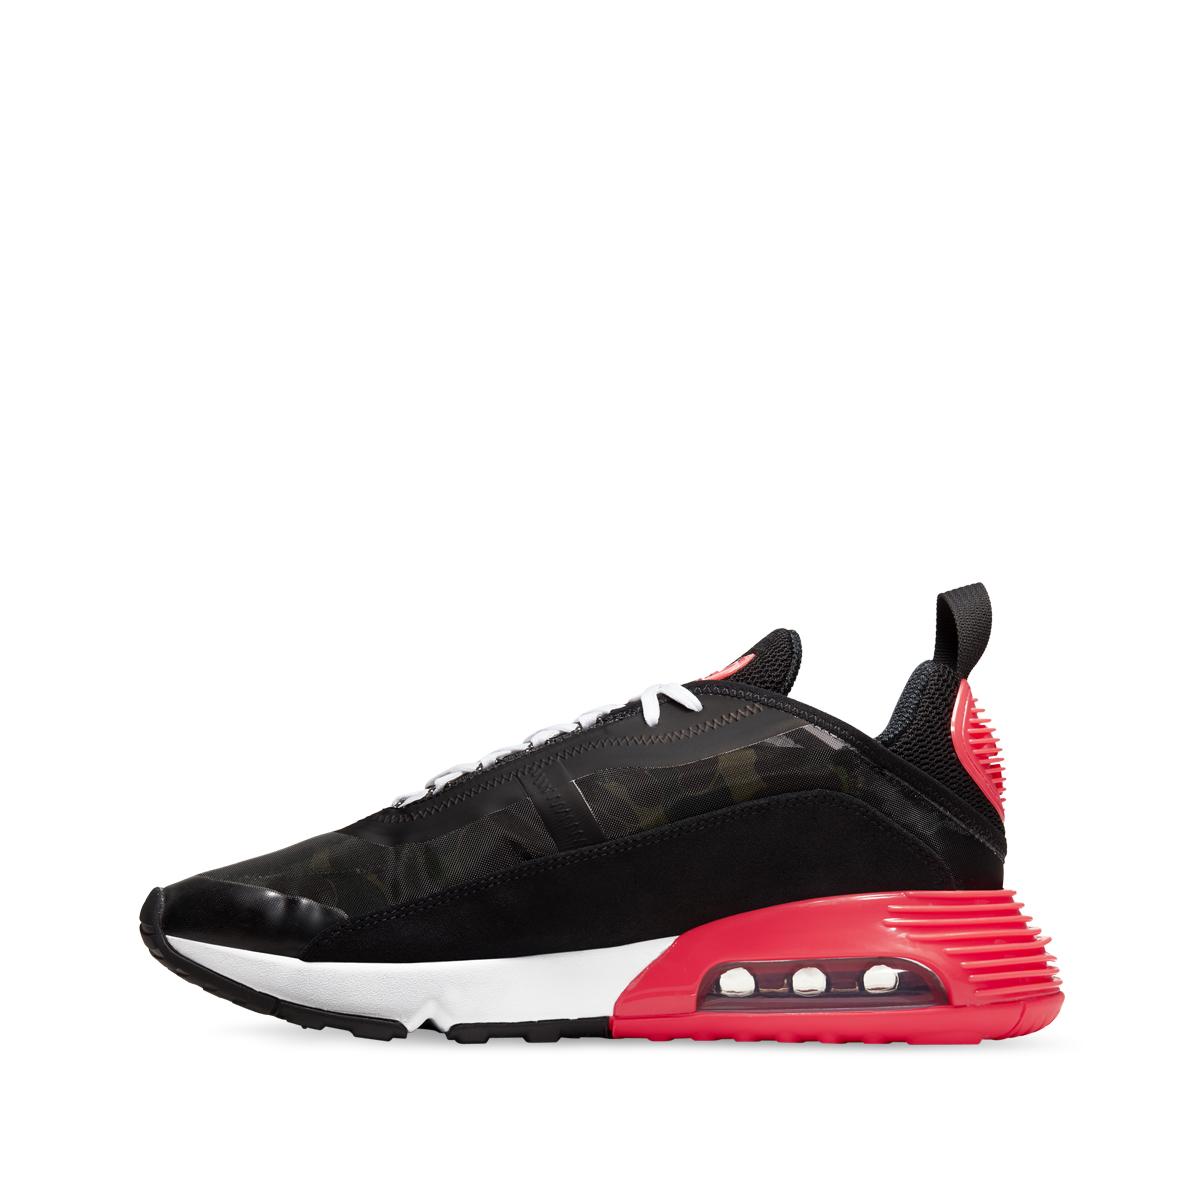 "Nike Air Max 2090 SP ""Infrared Duck Camo"""